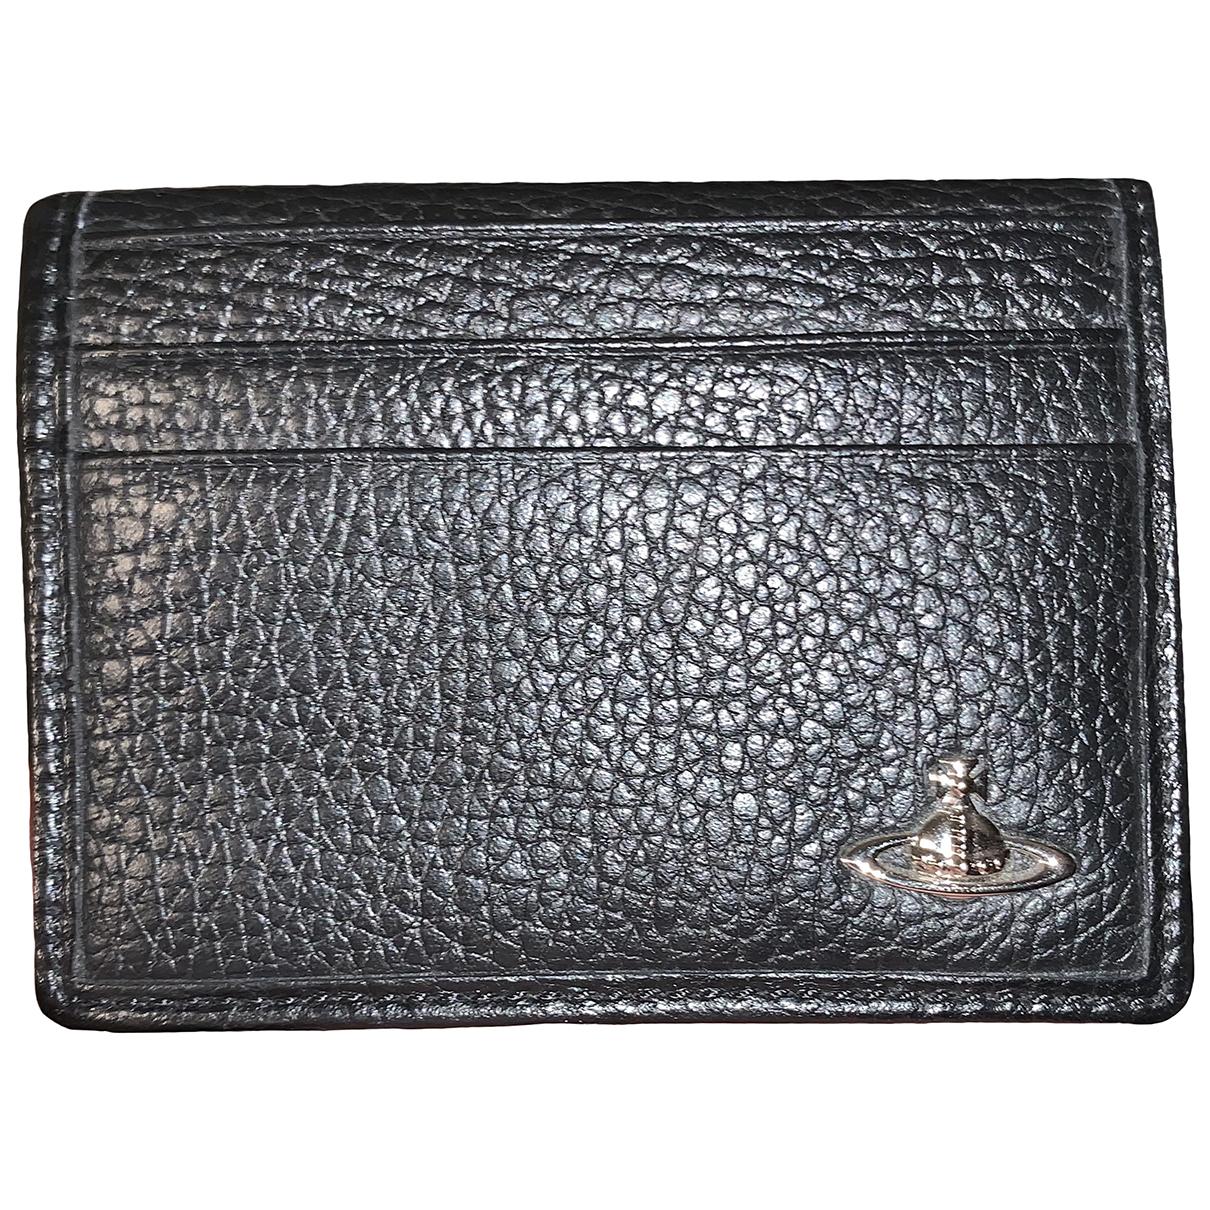 Vivienne Westwood N Black Leather Small bag, wallet & cases for Men N